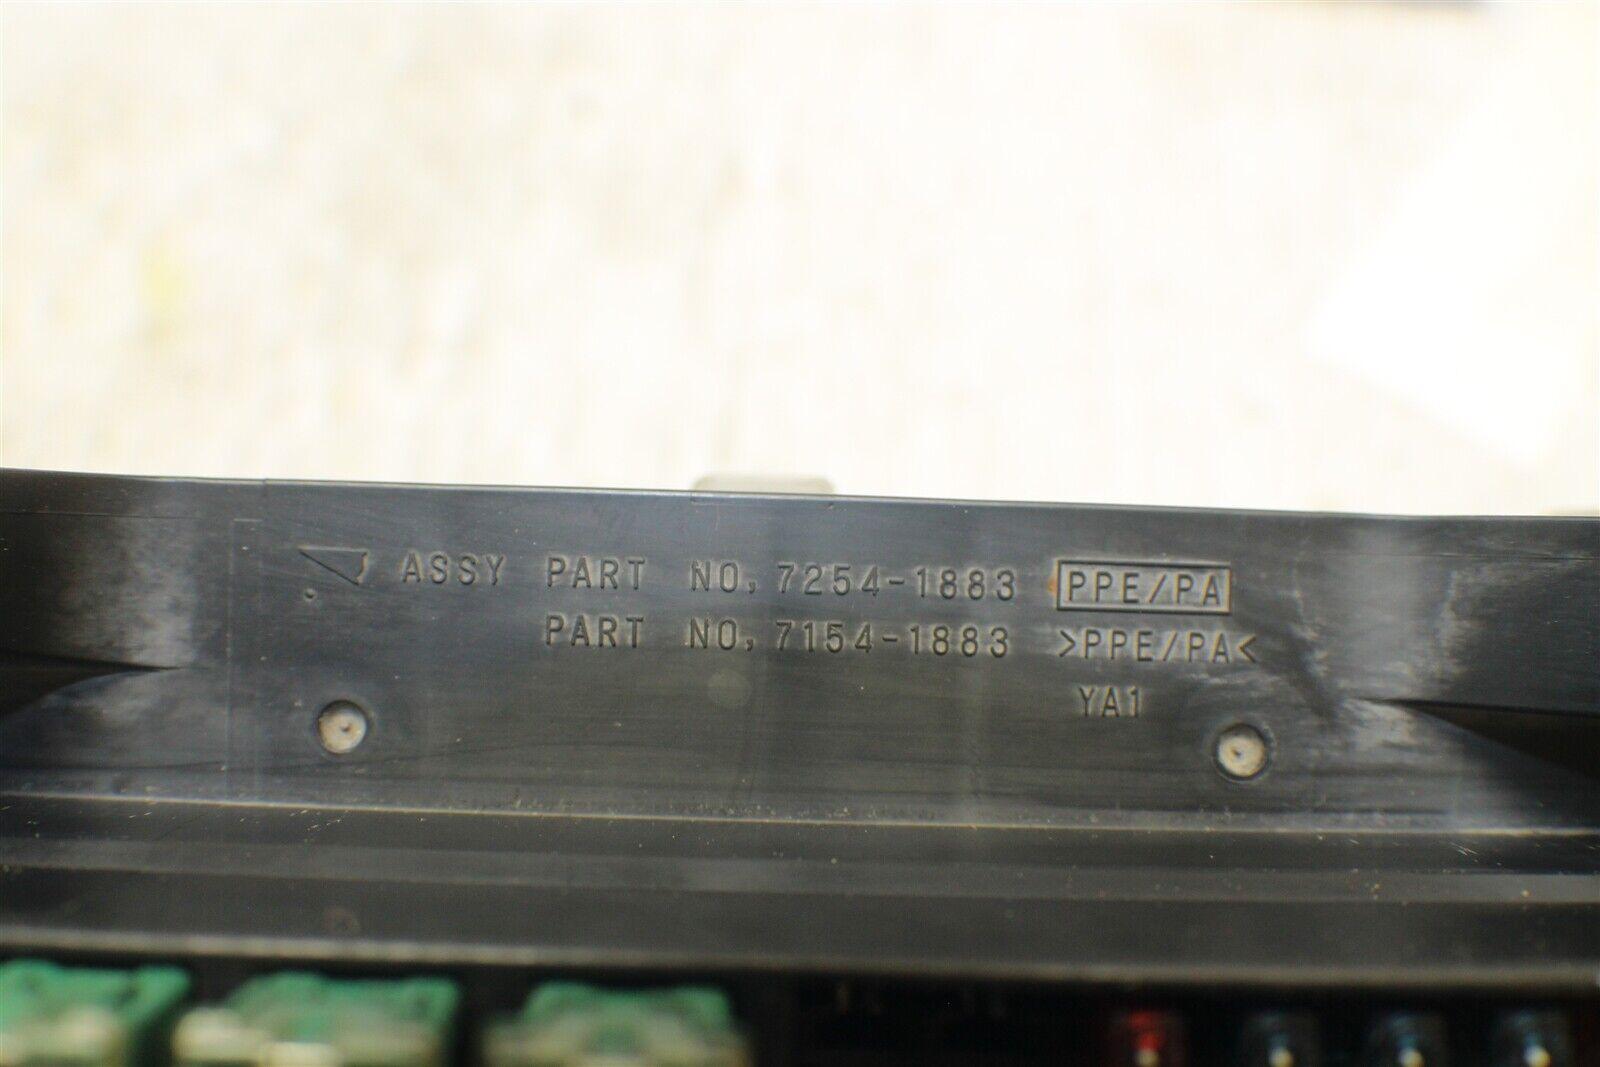 2000 2003 nissan maxima fuse box relay unit module 72541883 oem 2017 12g4 [ 1600 x 1067 Pixel ]